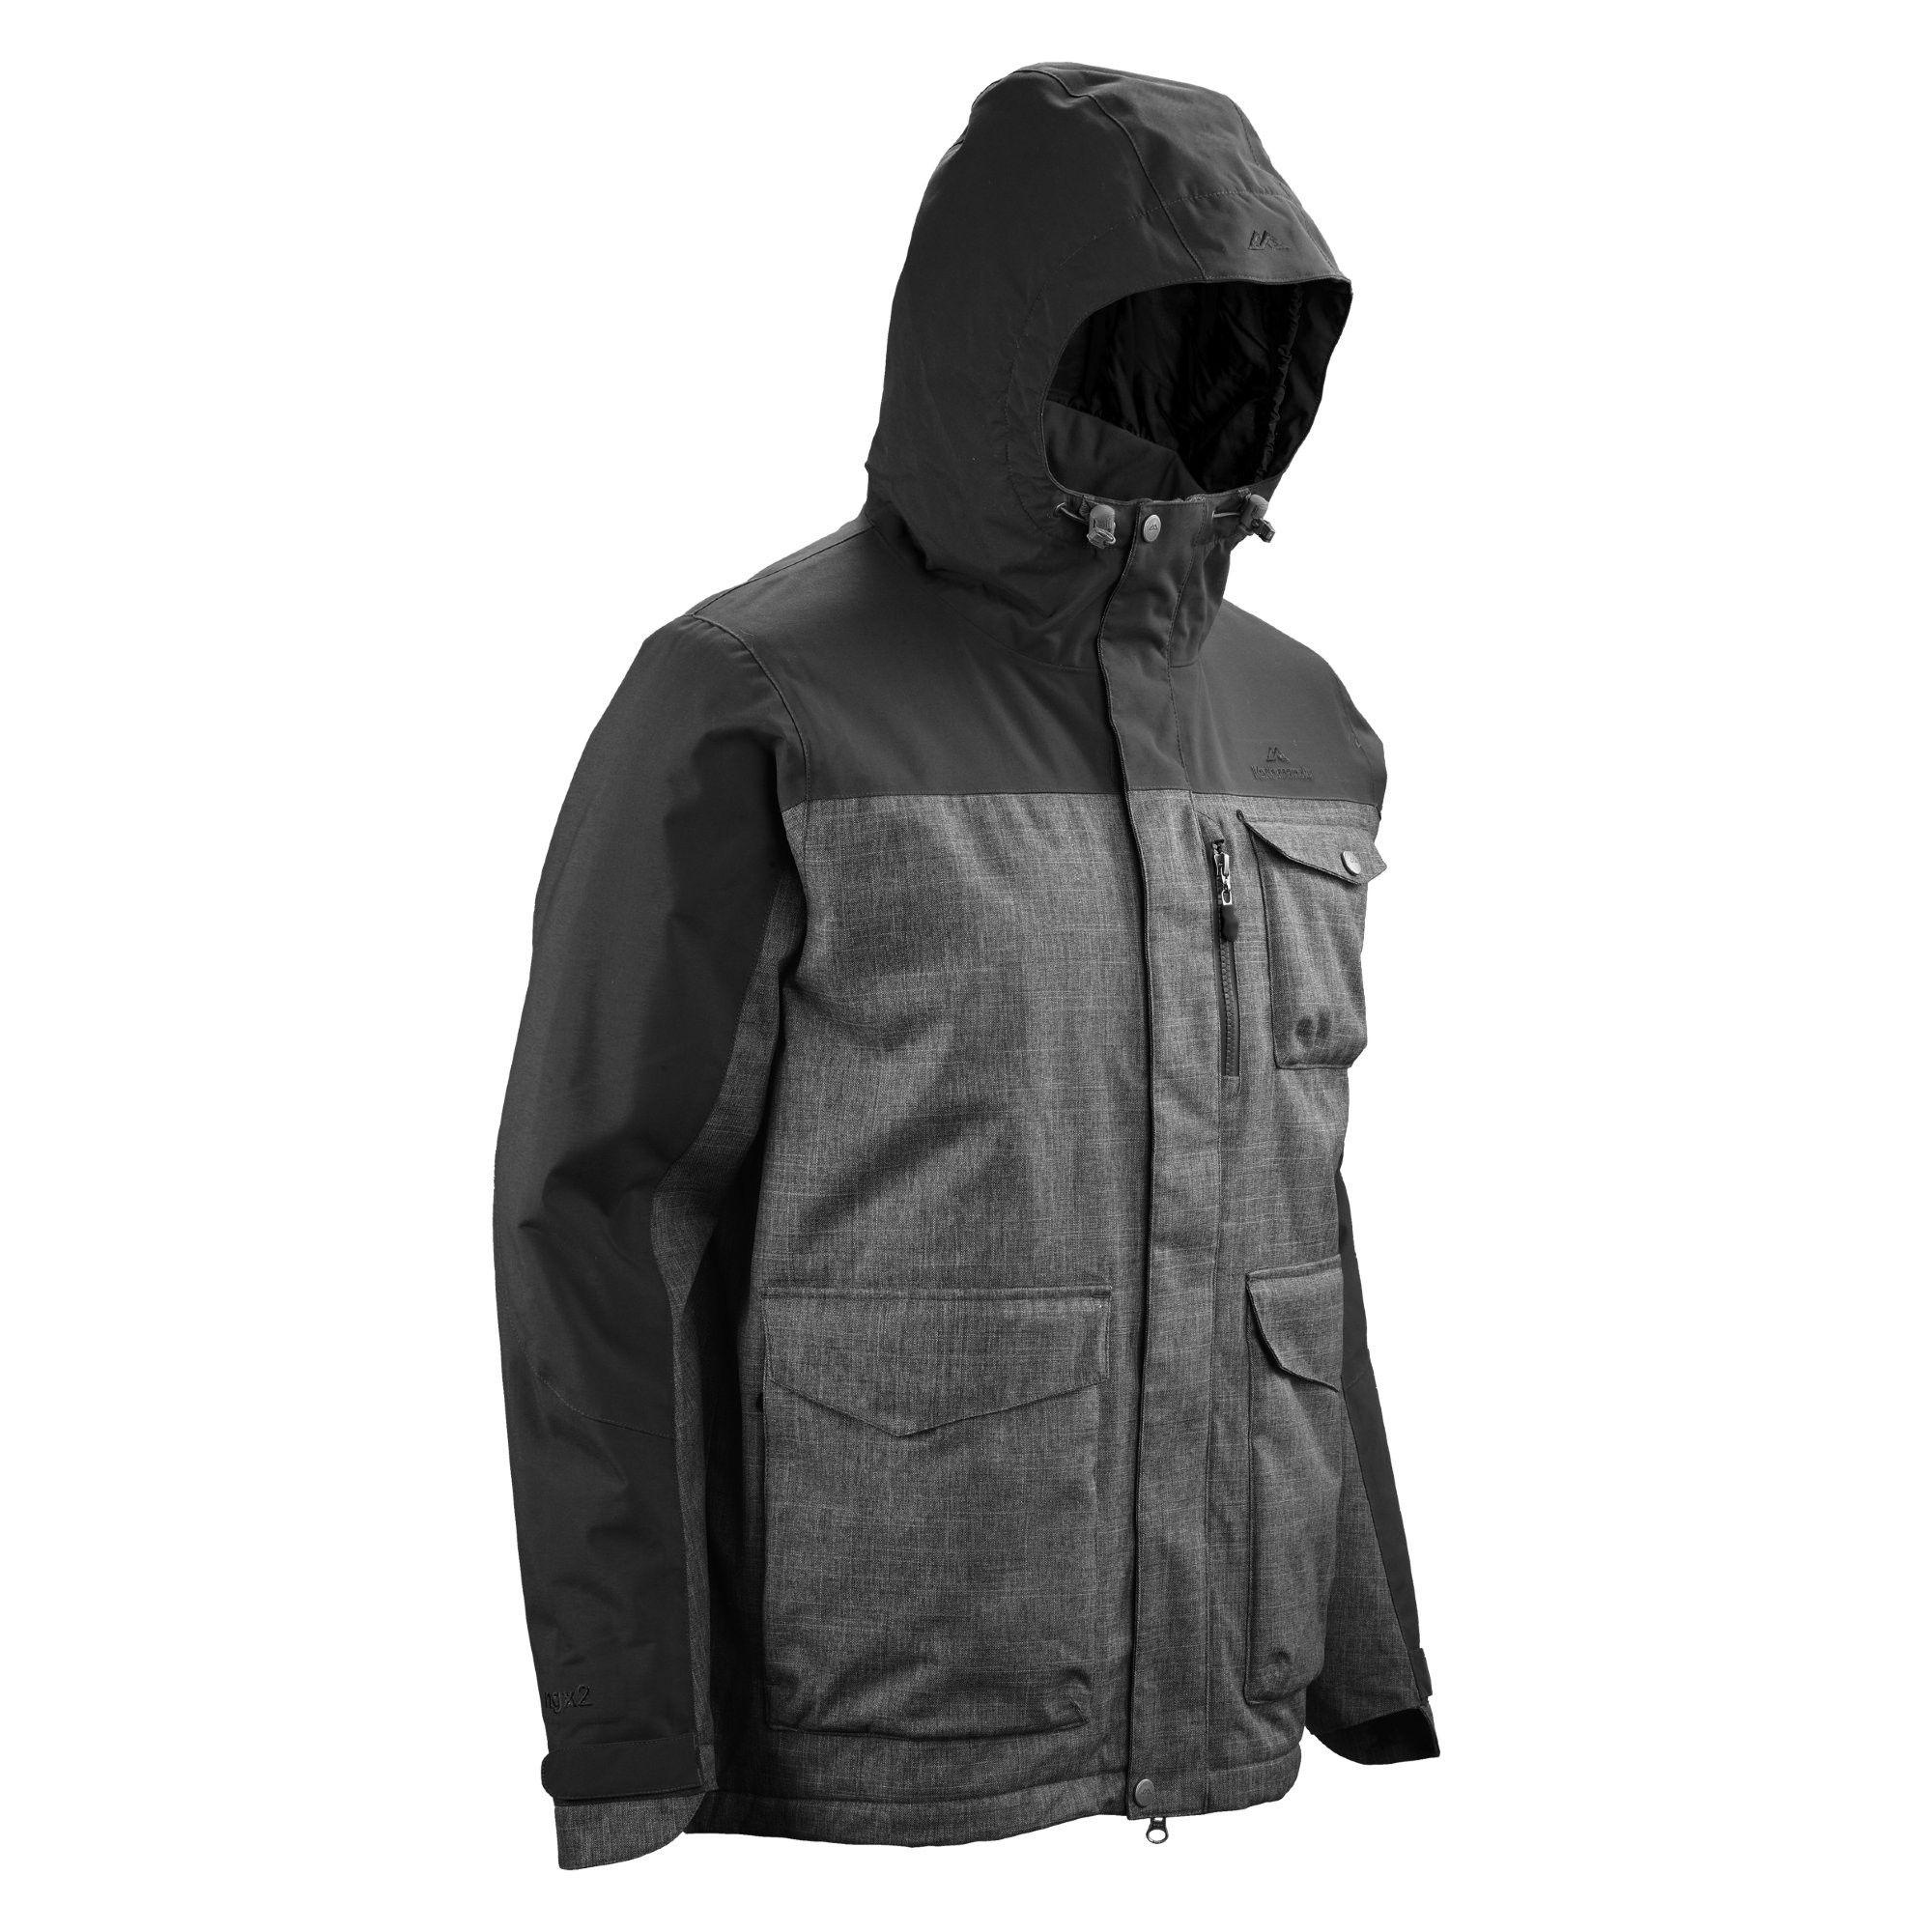 1e9653063c Buy Teton Men s 2 Layer Waterproof Snow Sport Jacket v3 - Black online at  Kathmandu